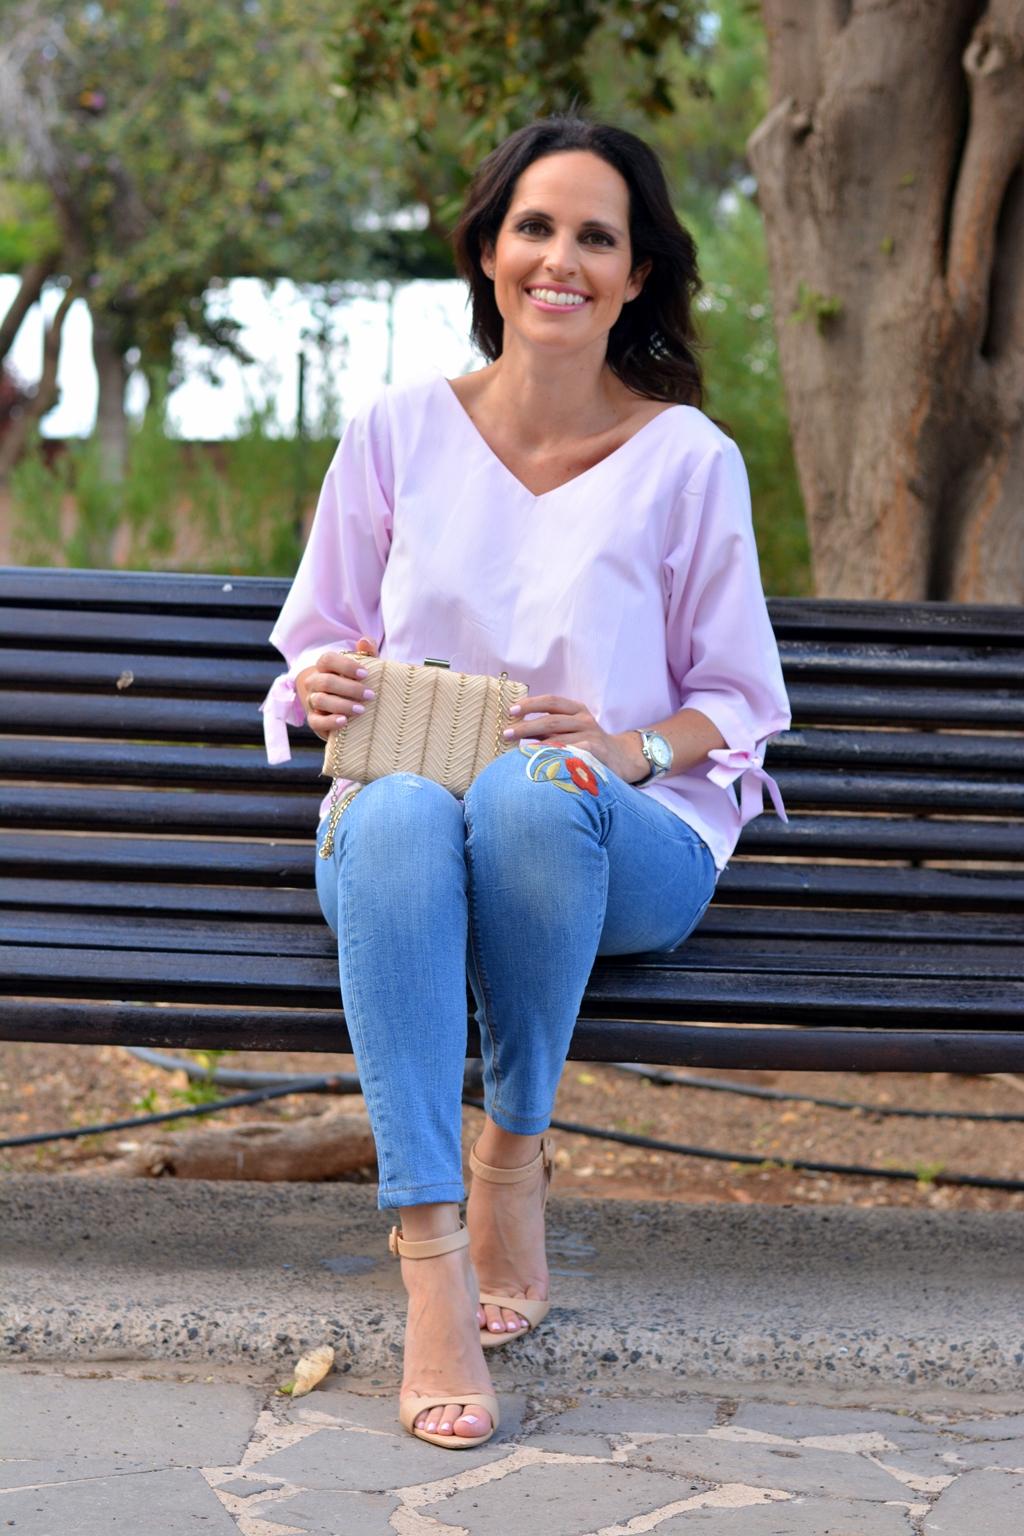 zara-jeans-romwe-blouse-pink